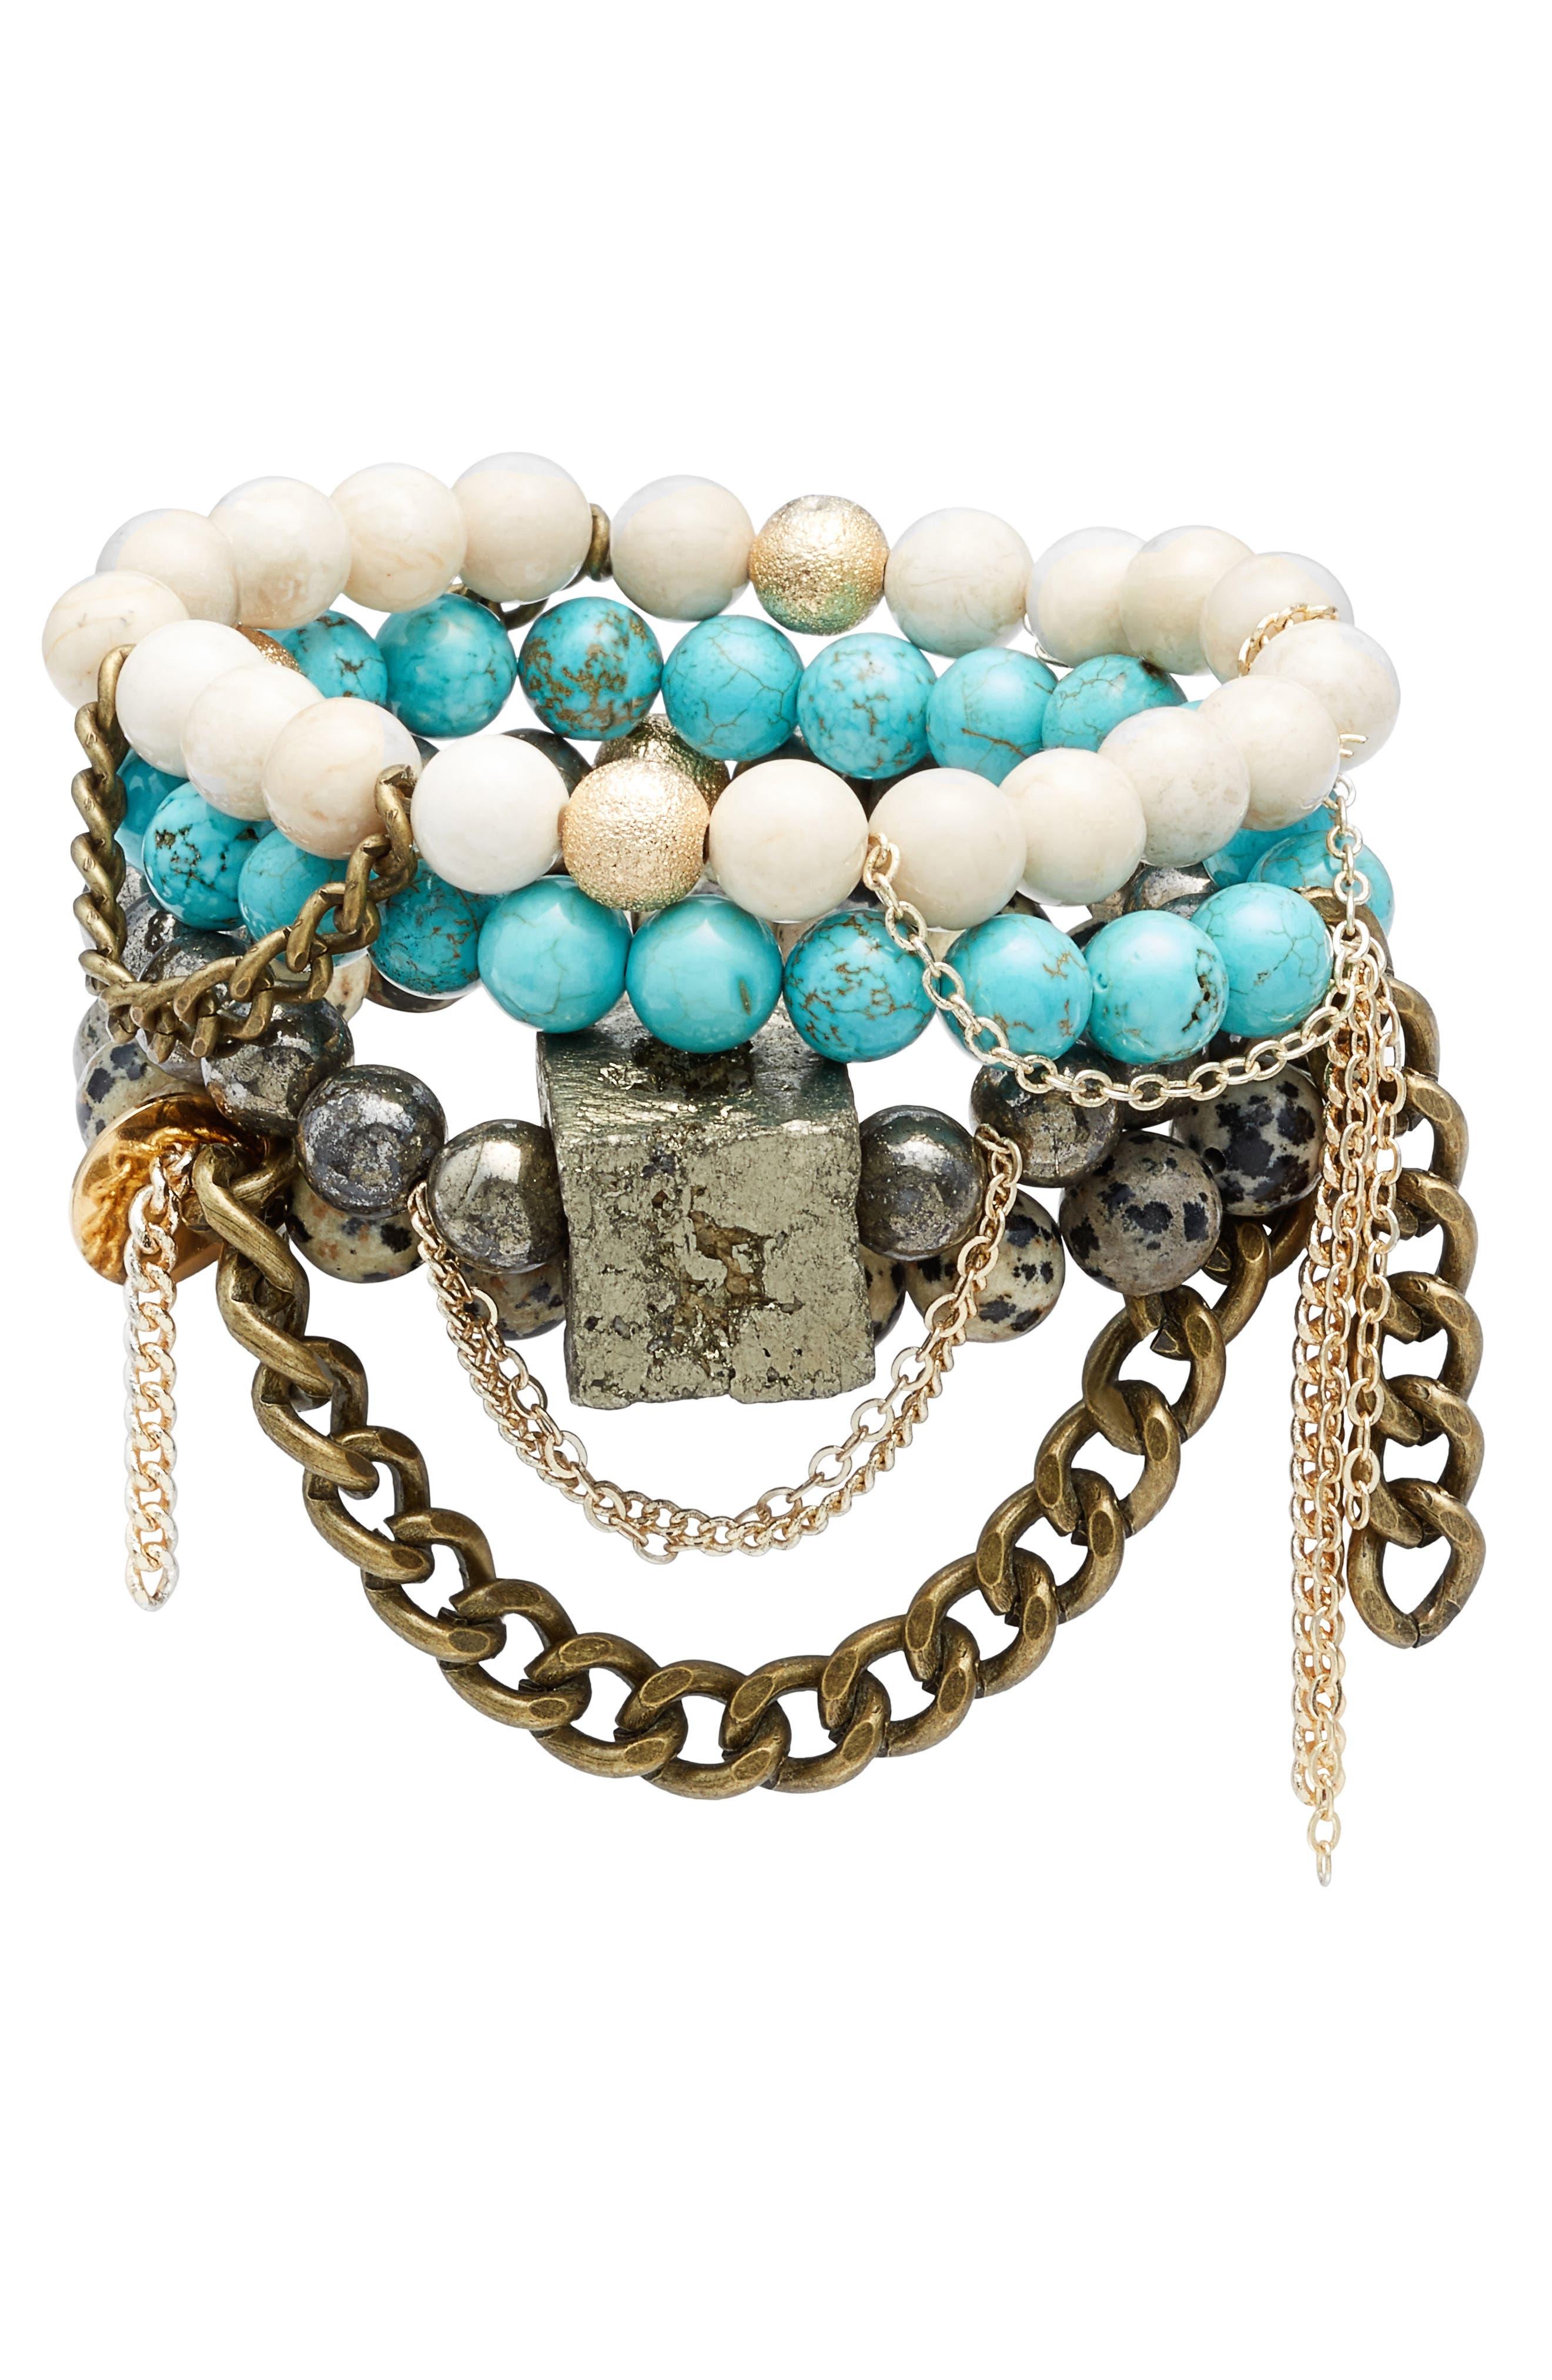 THE LACE PROJECT Set of 4 Bead Stretch Bracelets